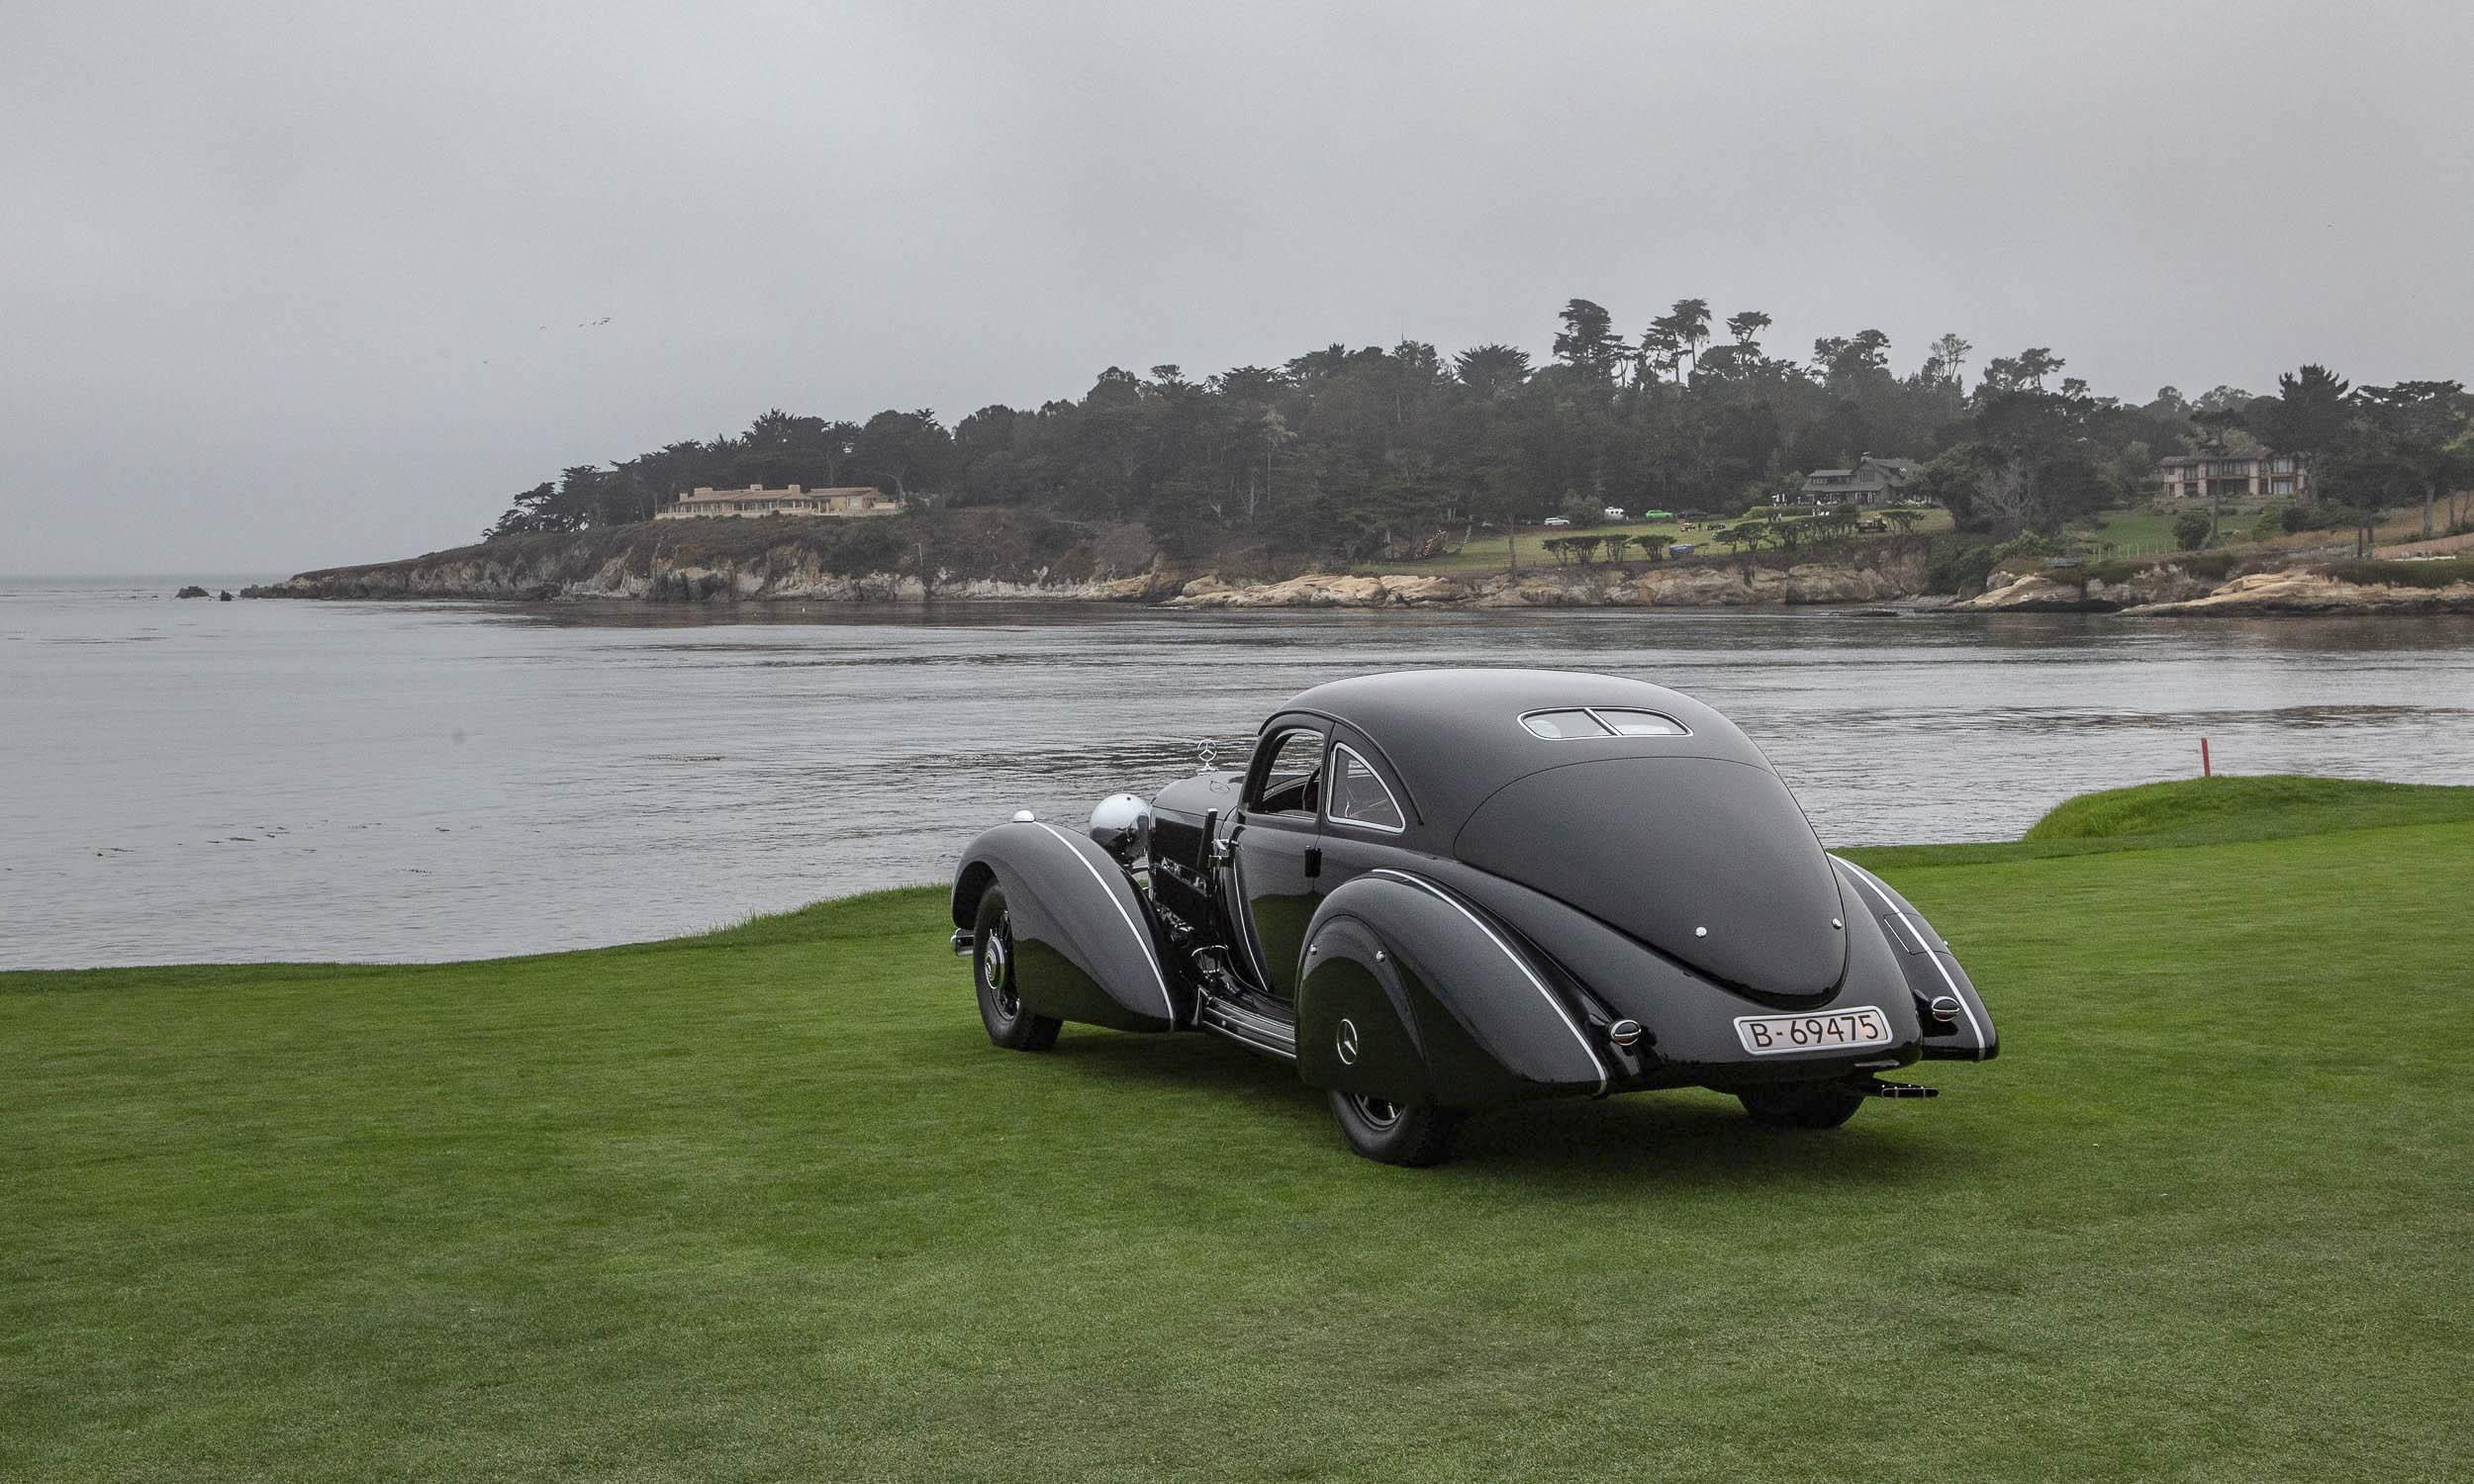 © Rod Hatfield, Automotive Content Experience